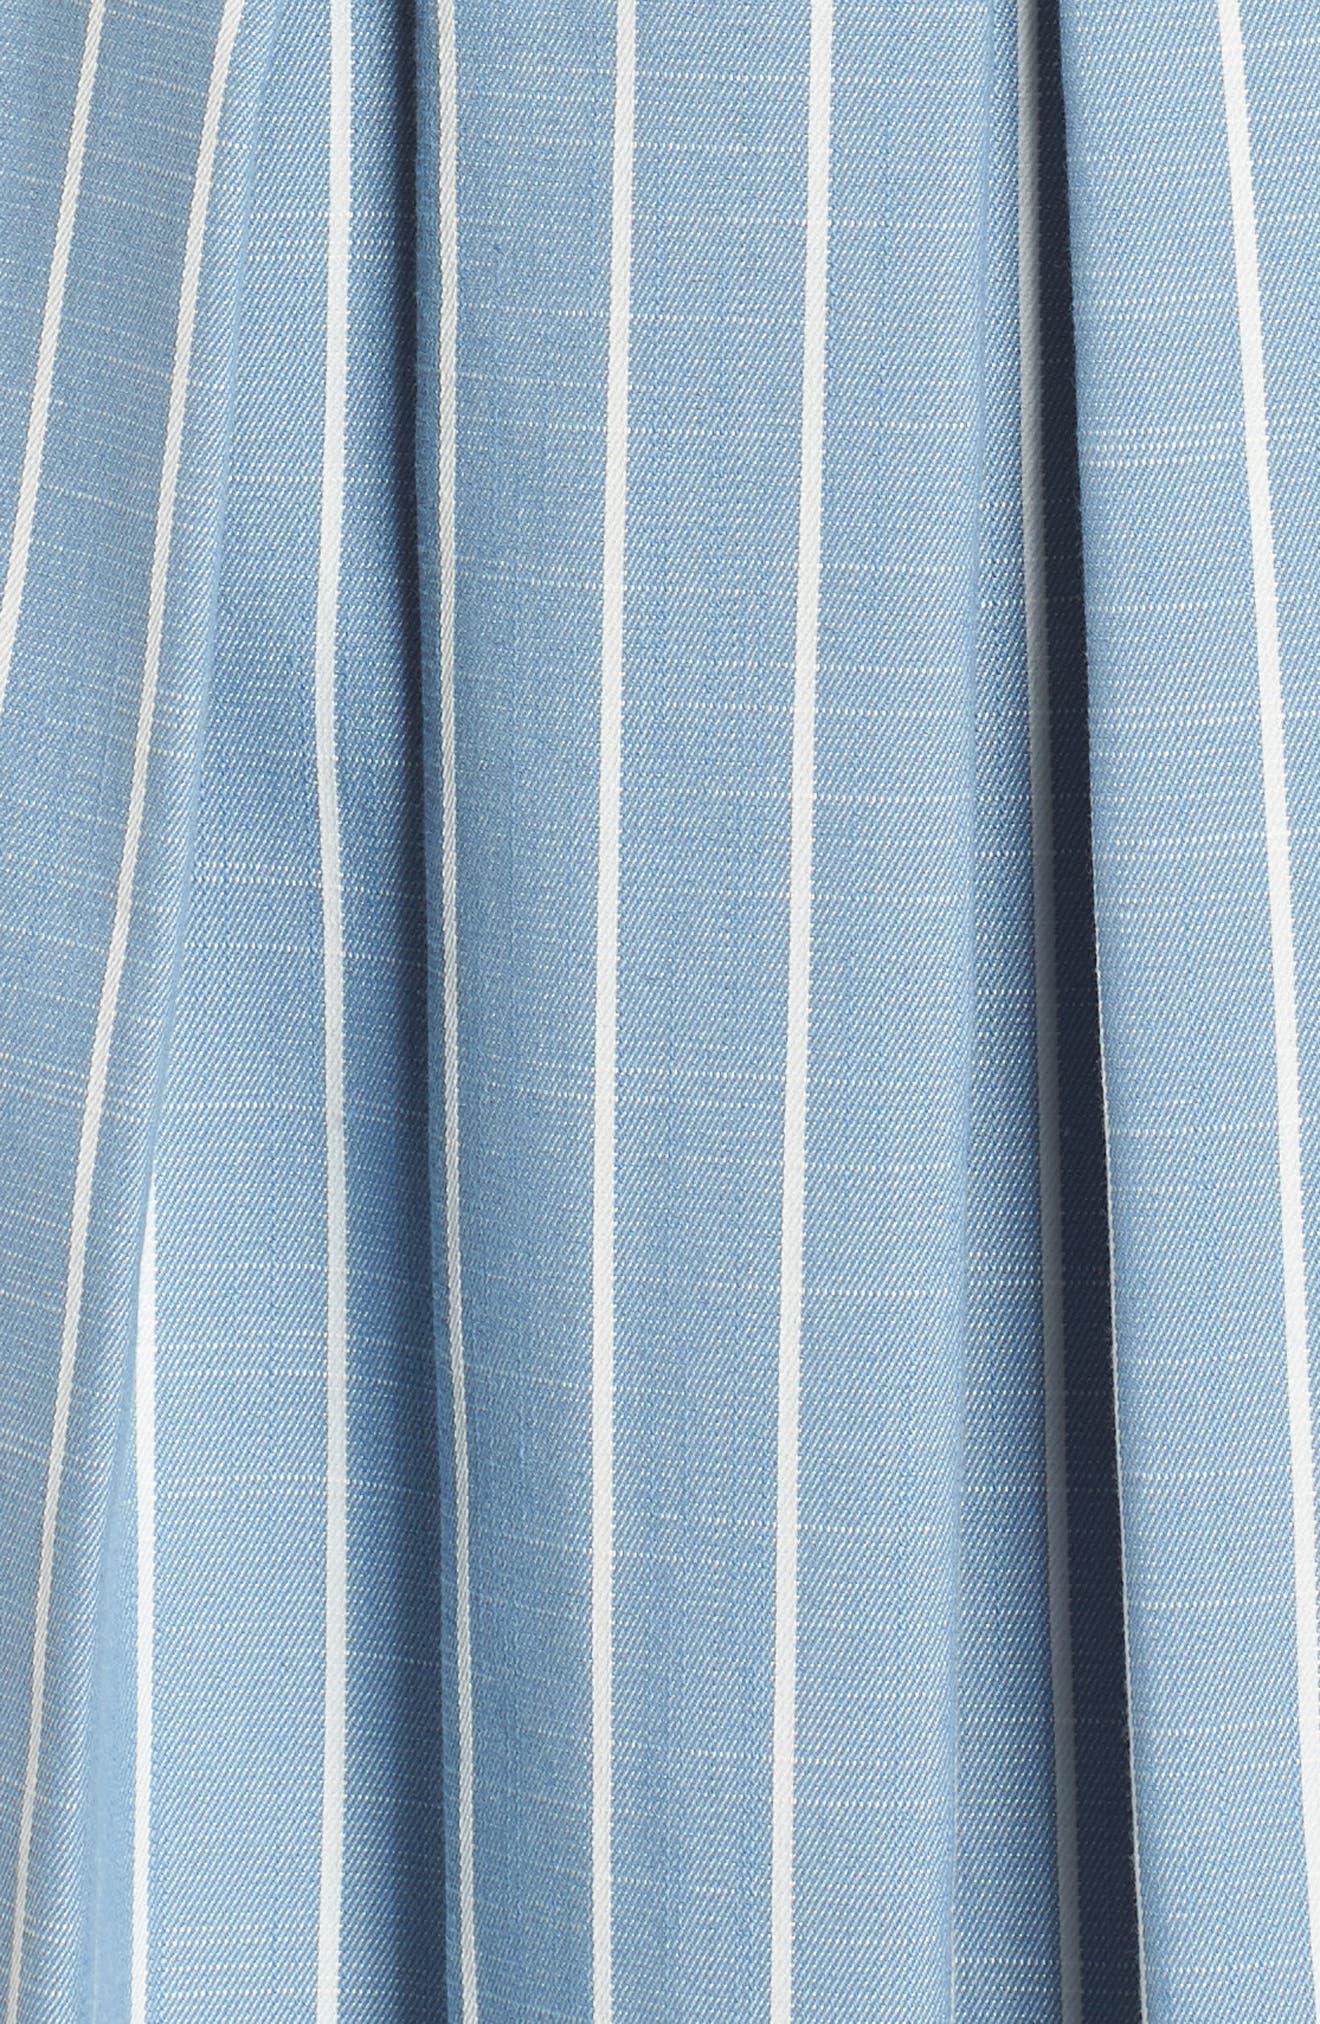 Samantha Slub Stripe Fit & Flare Dress,                             Alternate thumbnail 7, color,                             460